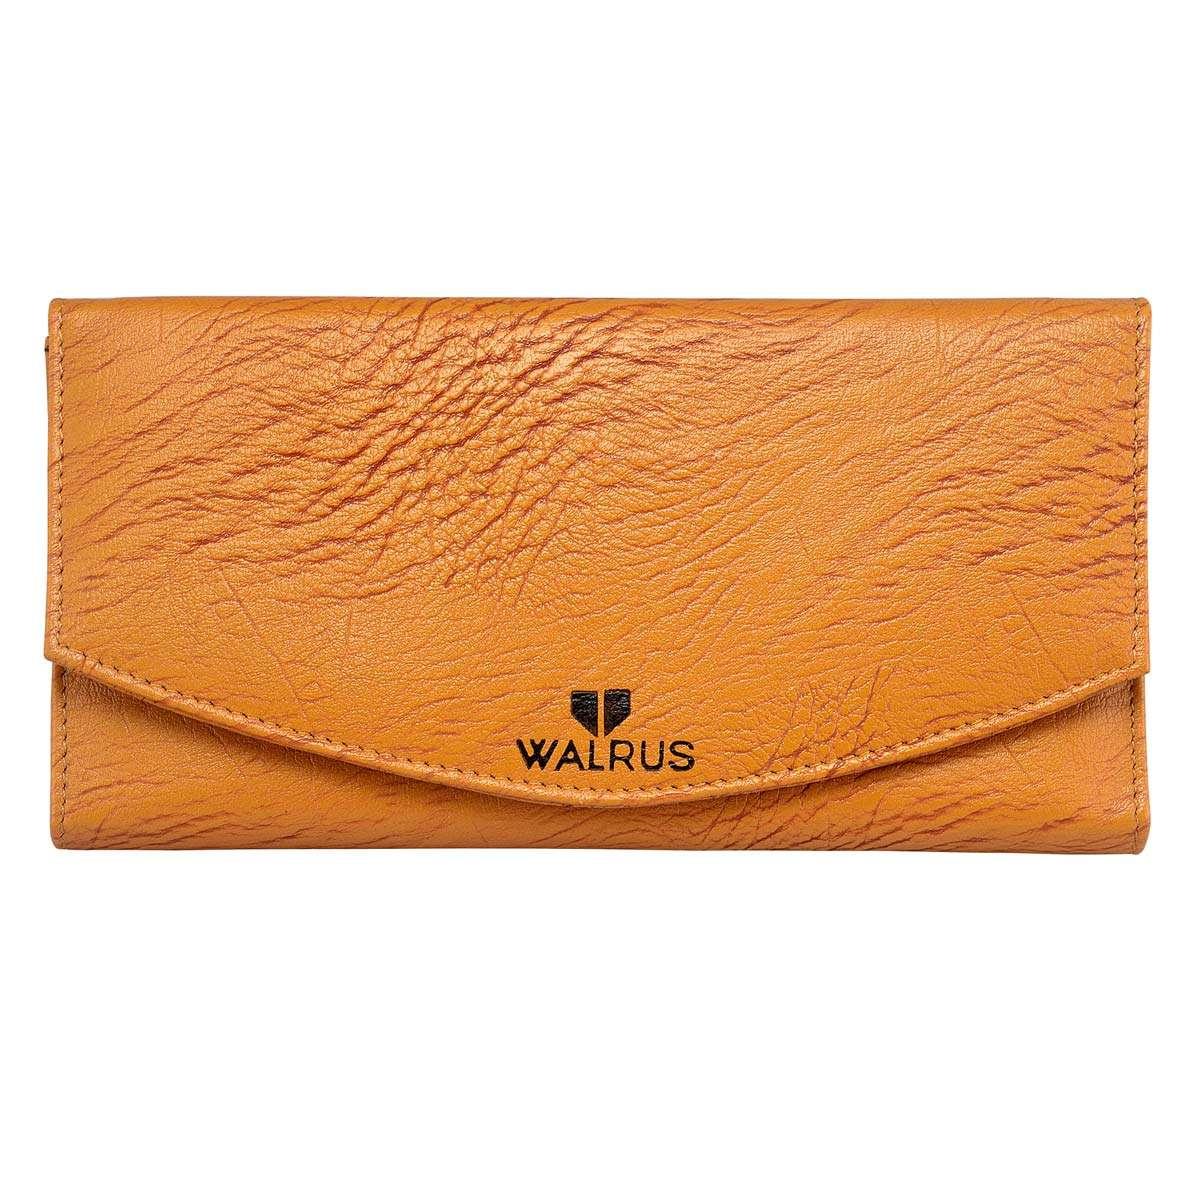 Walrus Chloe Tan Color Women Hand Clutch